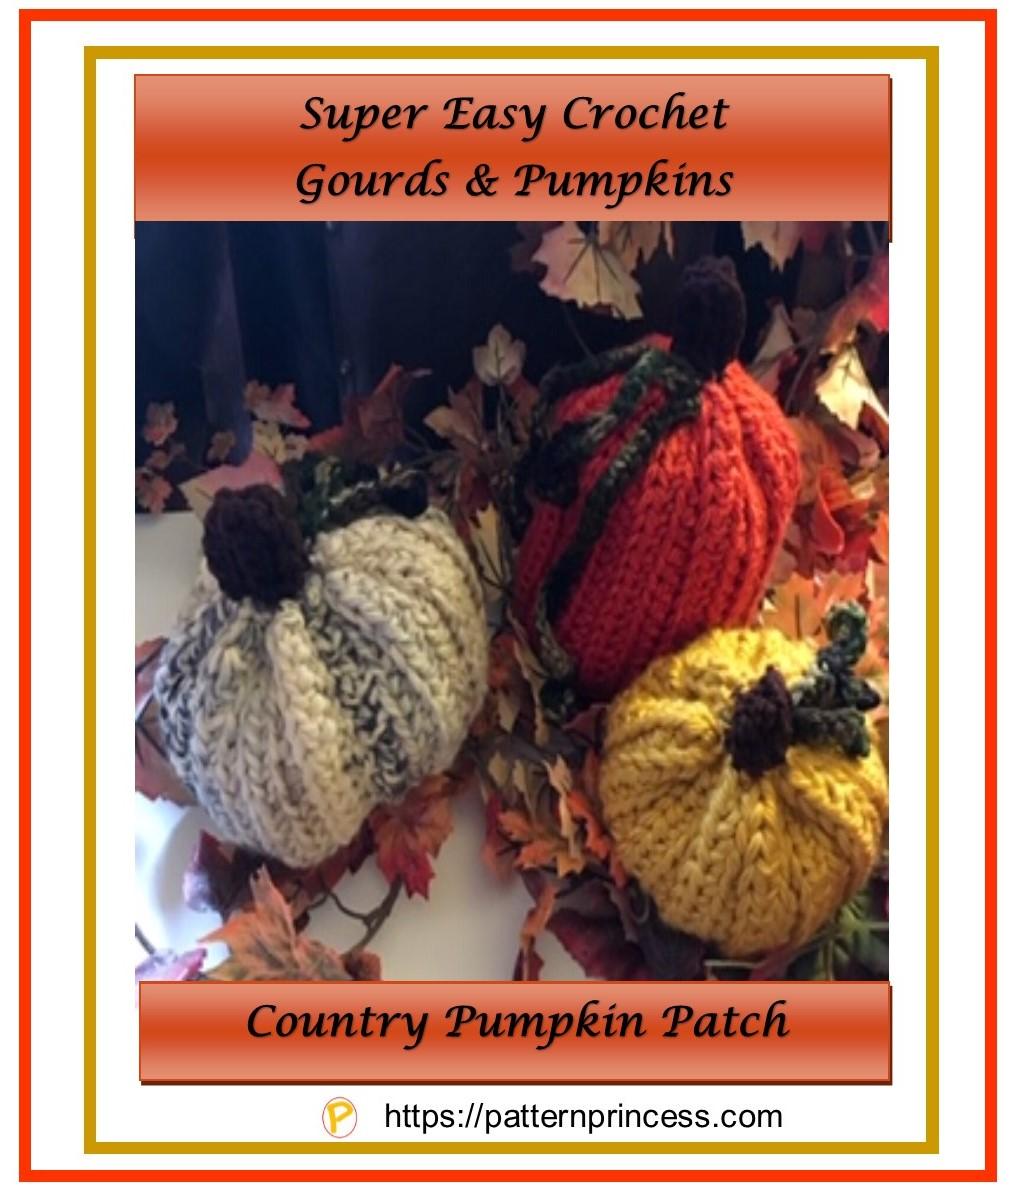 Super Easy Crochet Gourds and Pumpkins 1